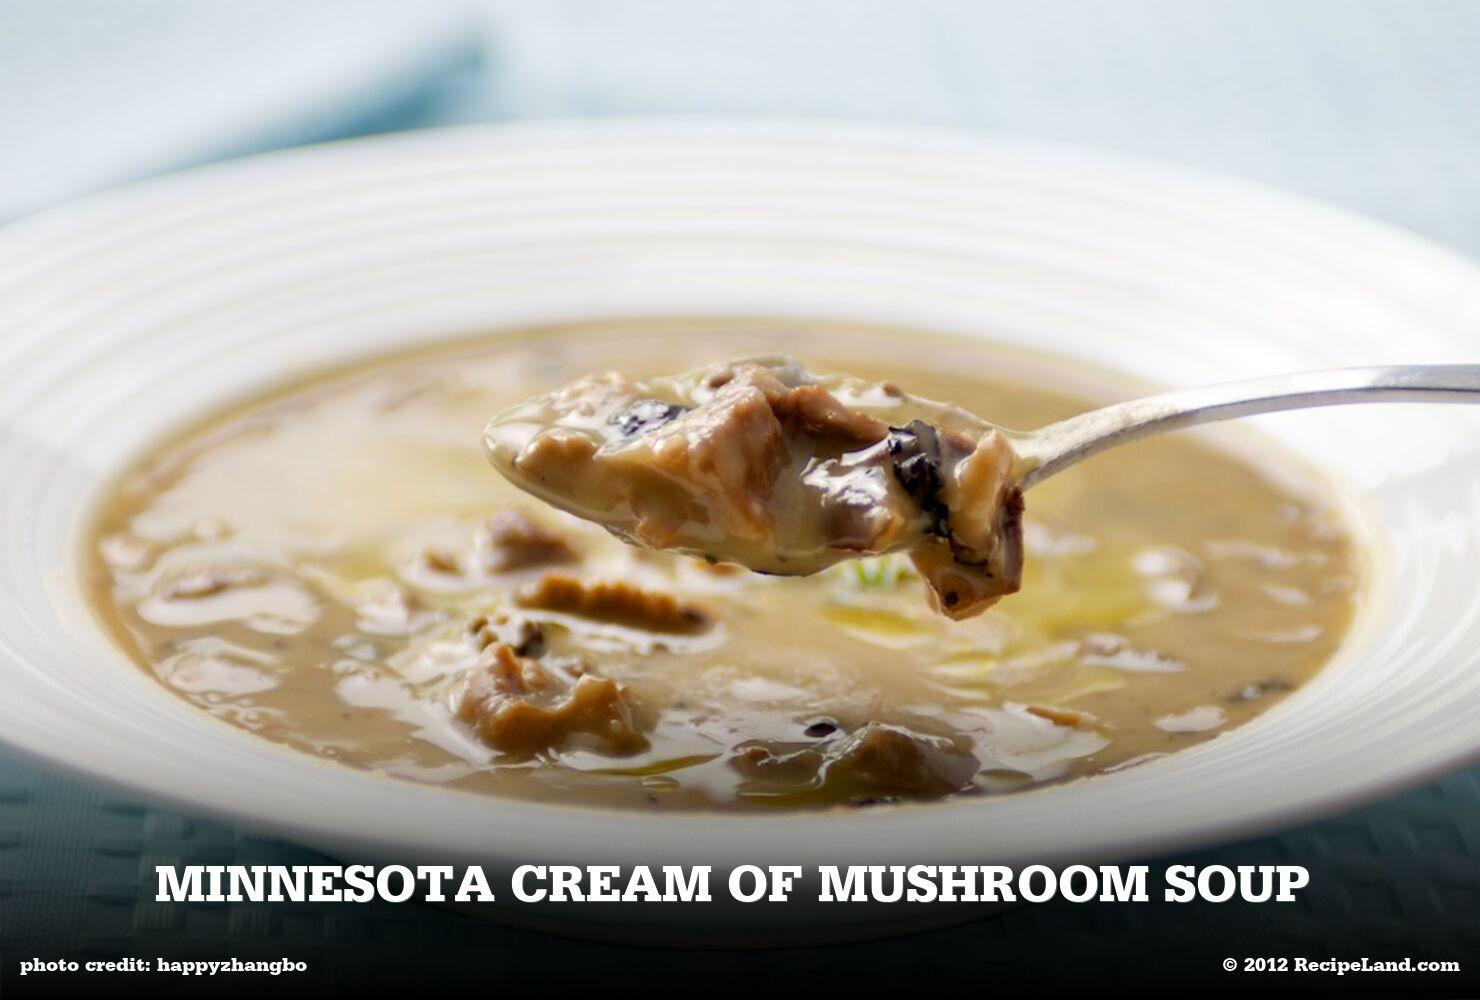 Minnesota Cream of Mushroom Soup